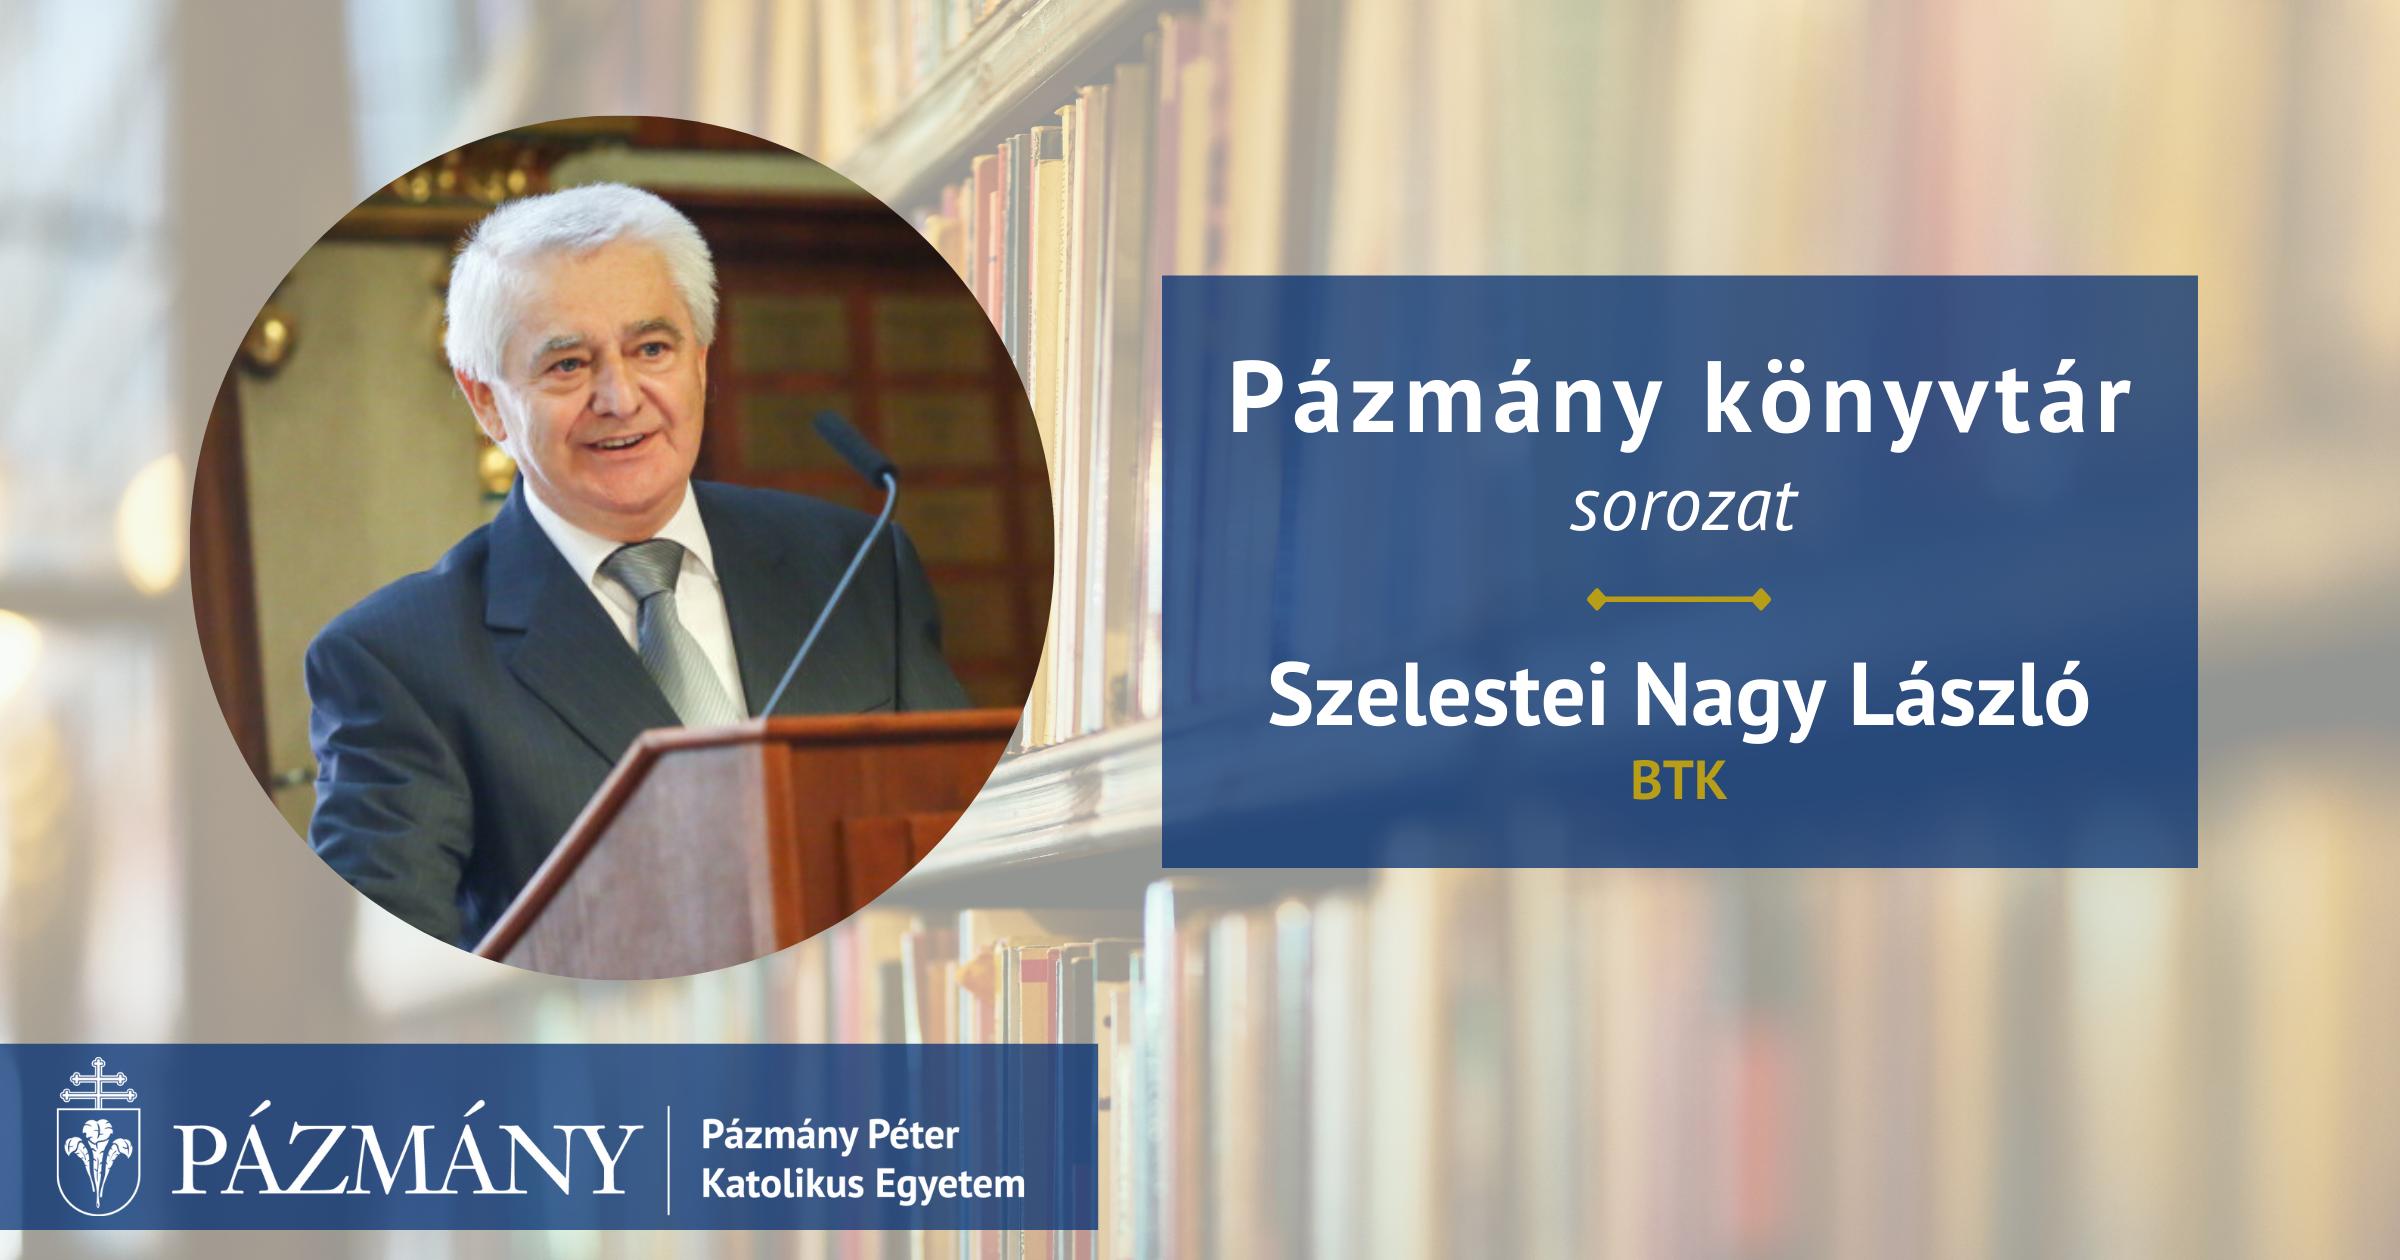 pazmany_konyvtar_sablon_1_1.png